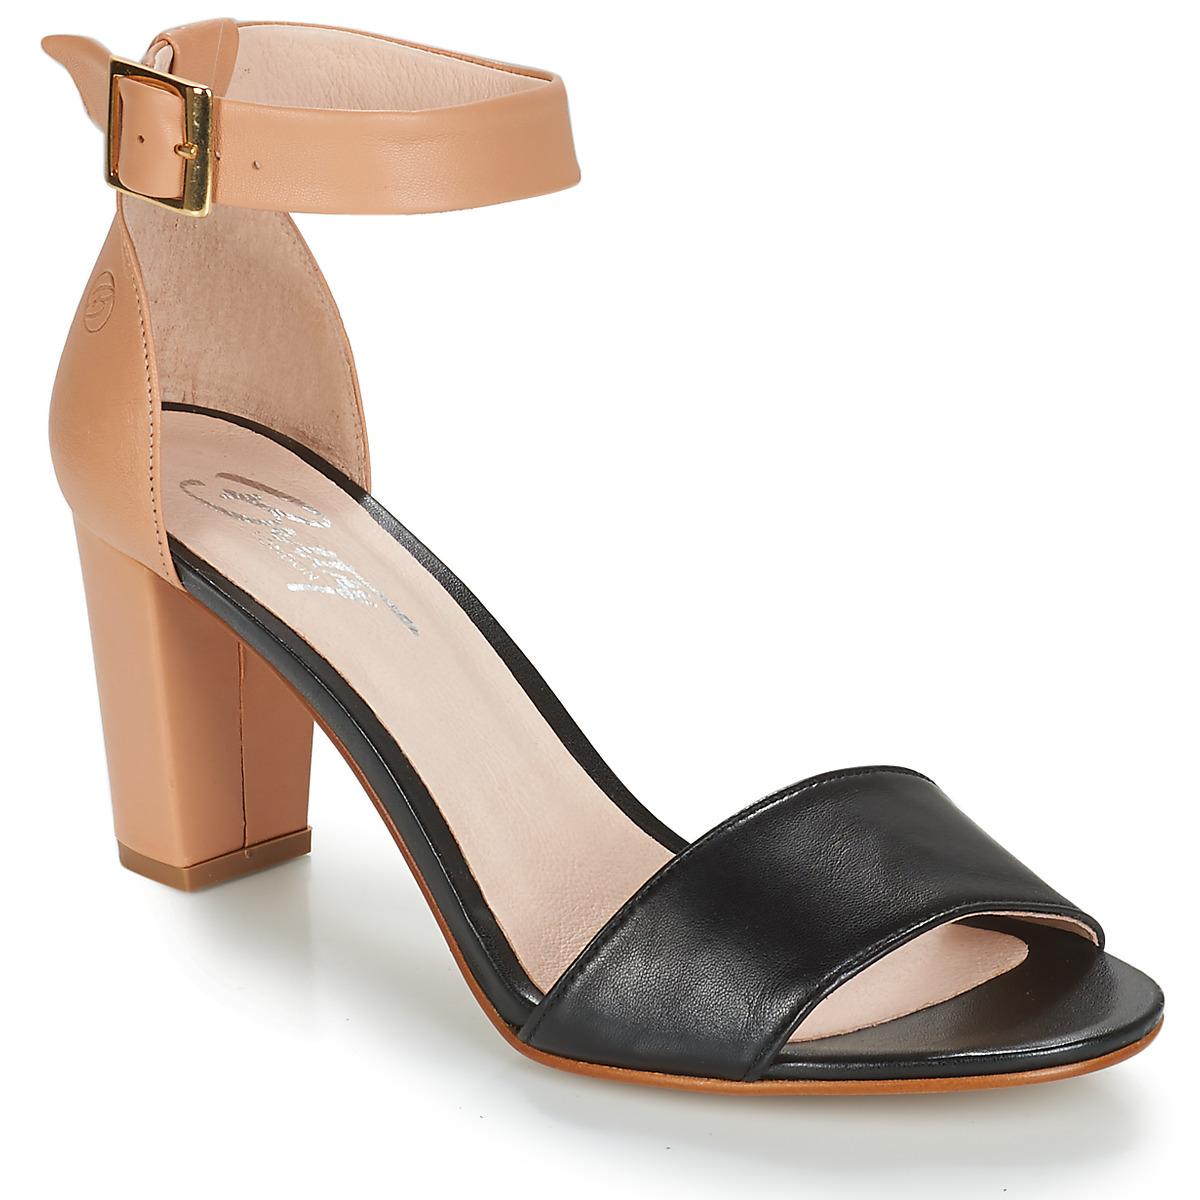 Sandals BT London CRETA Nude / Black